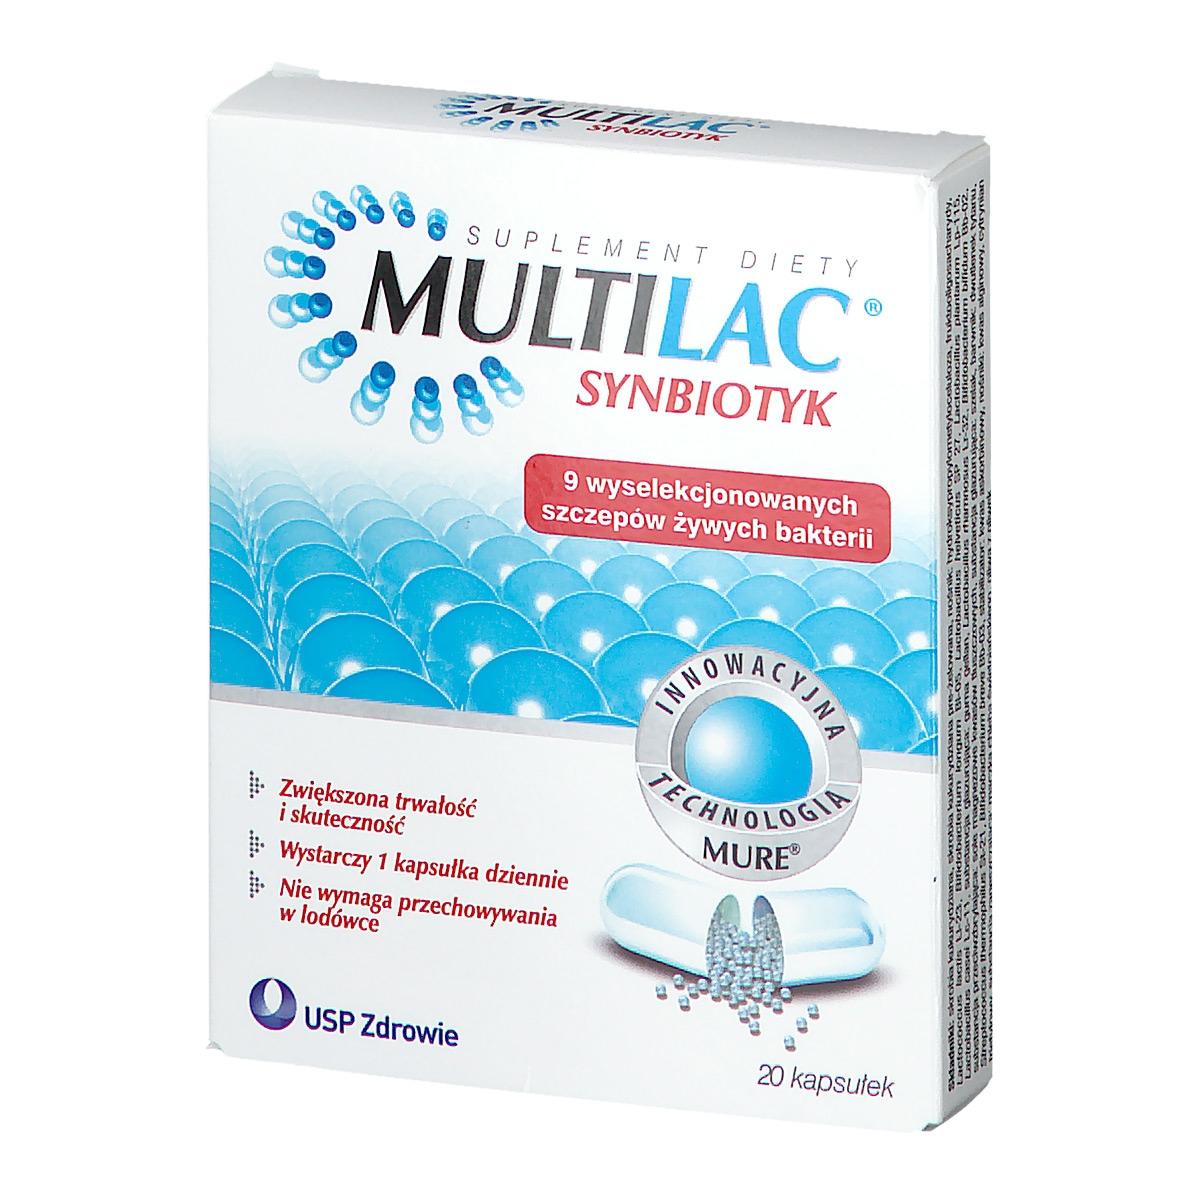 Multilac, synbiotyk (probiotyk + prebiotyk), kapsułki